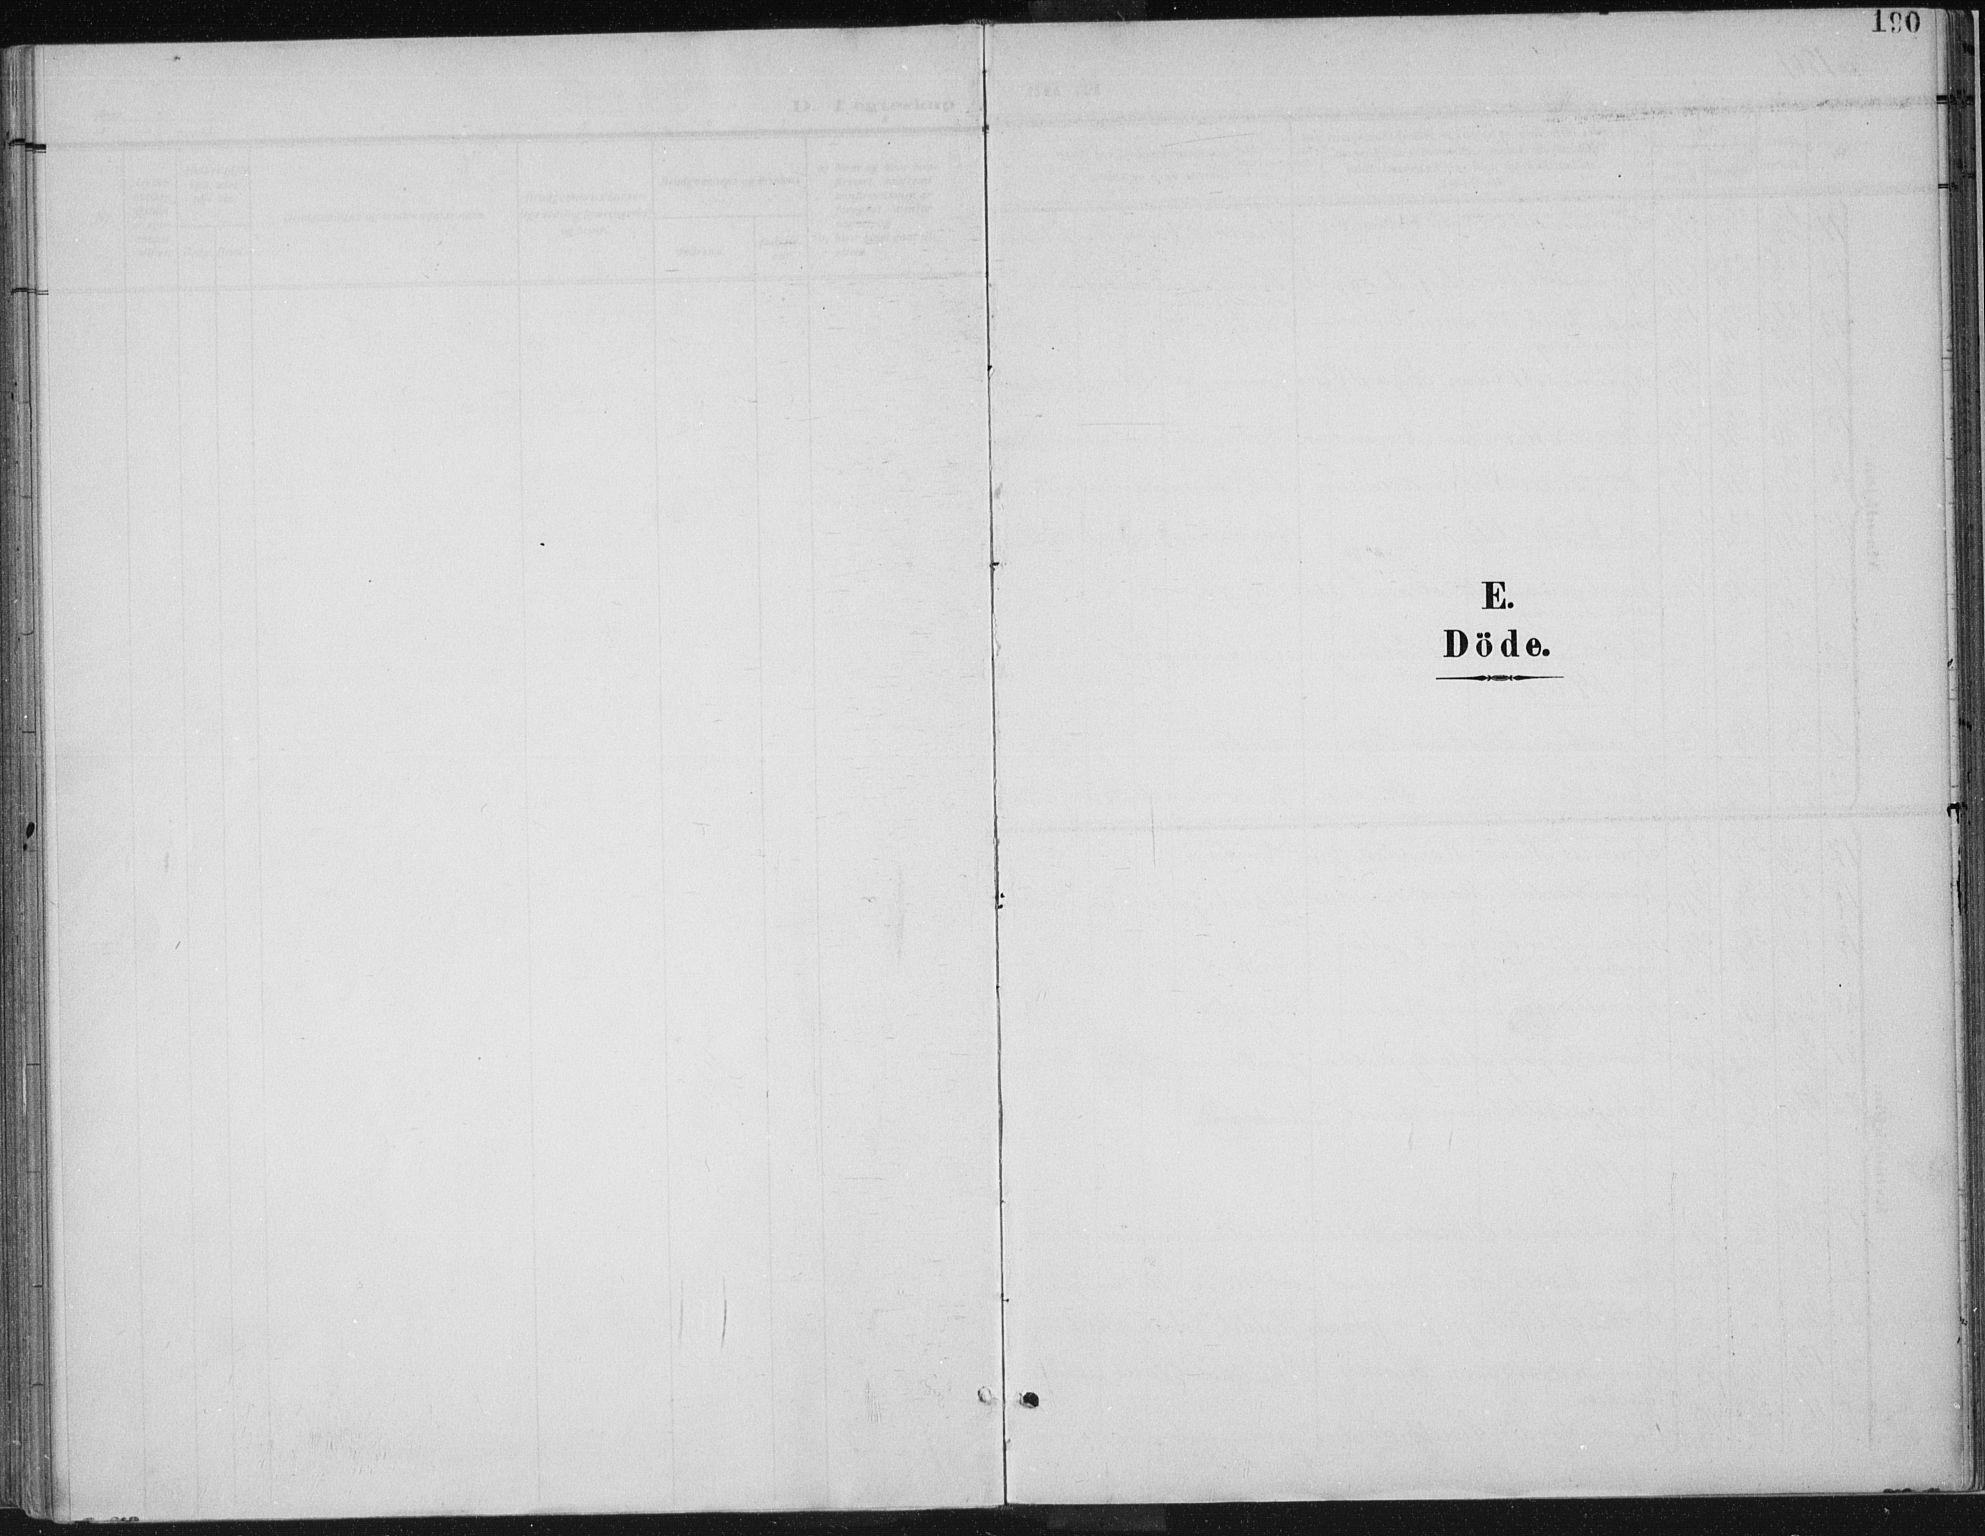 SAH, Vardal prestekontor, H/Ha/Haa/L0013: Ministerialbok nr. 13, 1901-1911, s. 190